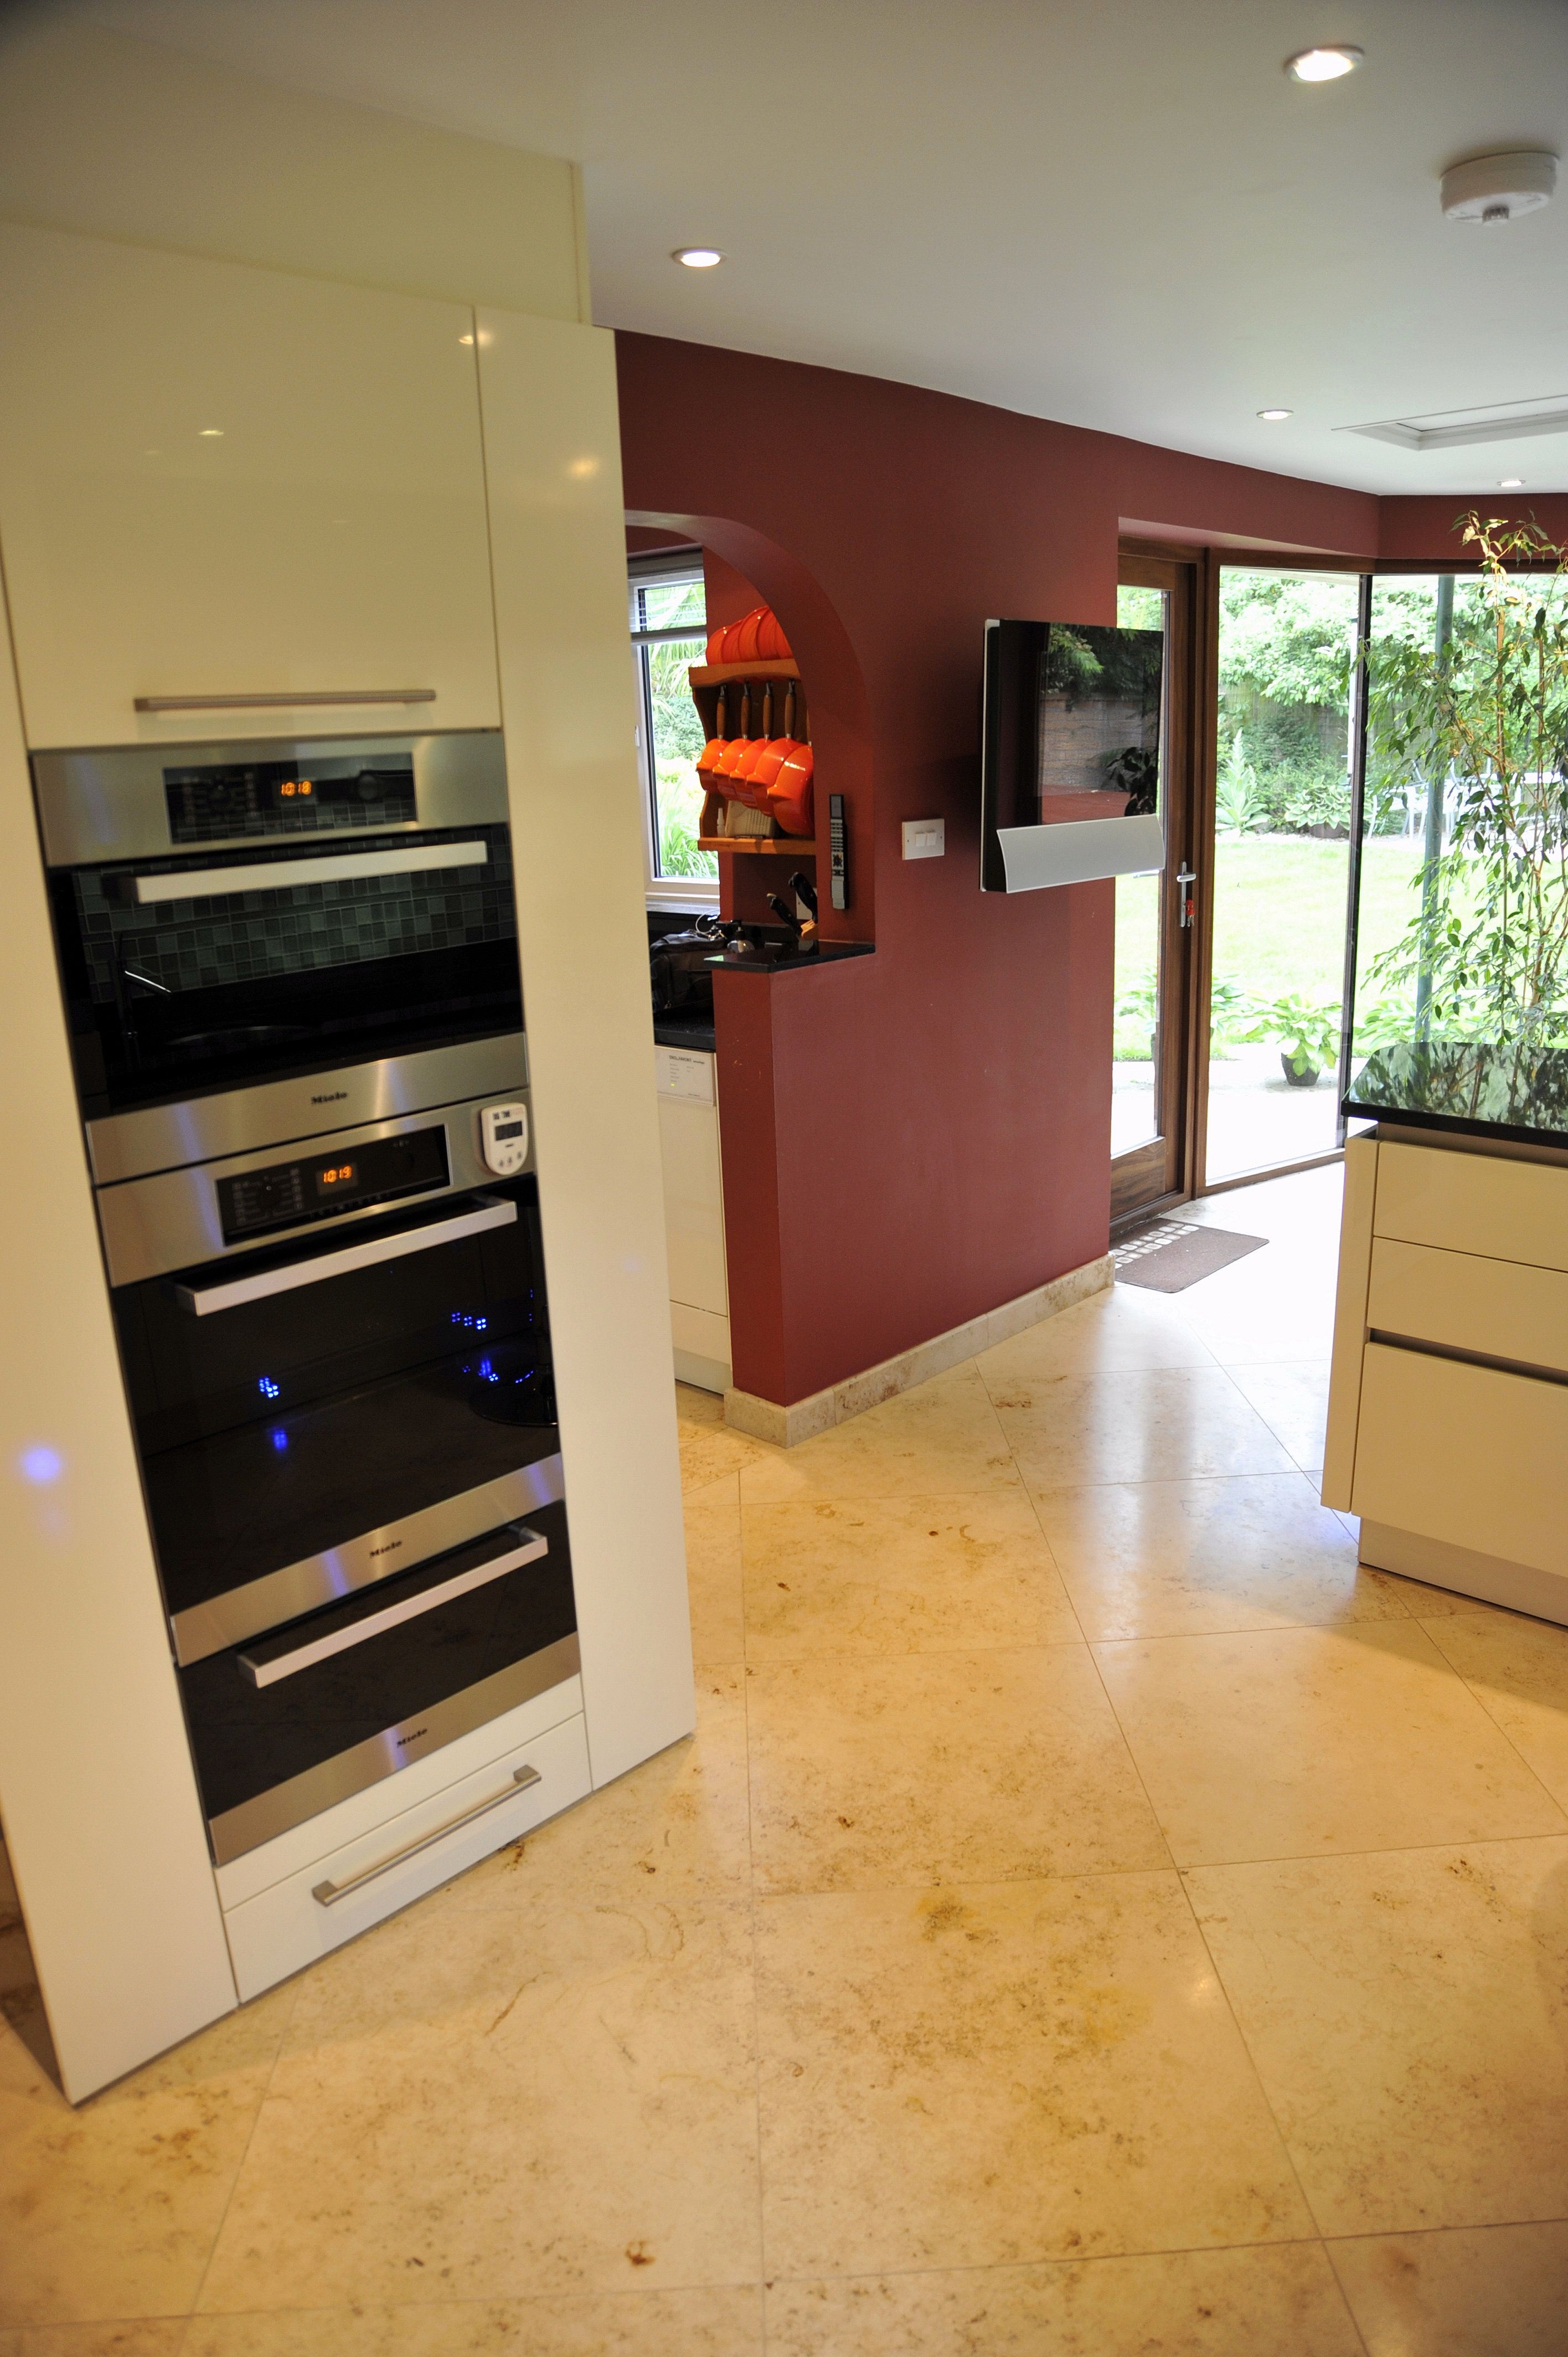 Kitchen Designing Online Fascinating Another Great Shot Of Our Modern Kichen With A Travertine Floor Design Decoration